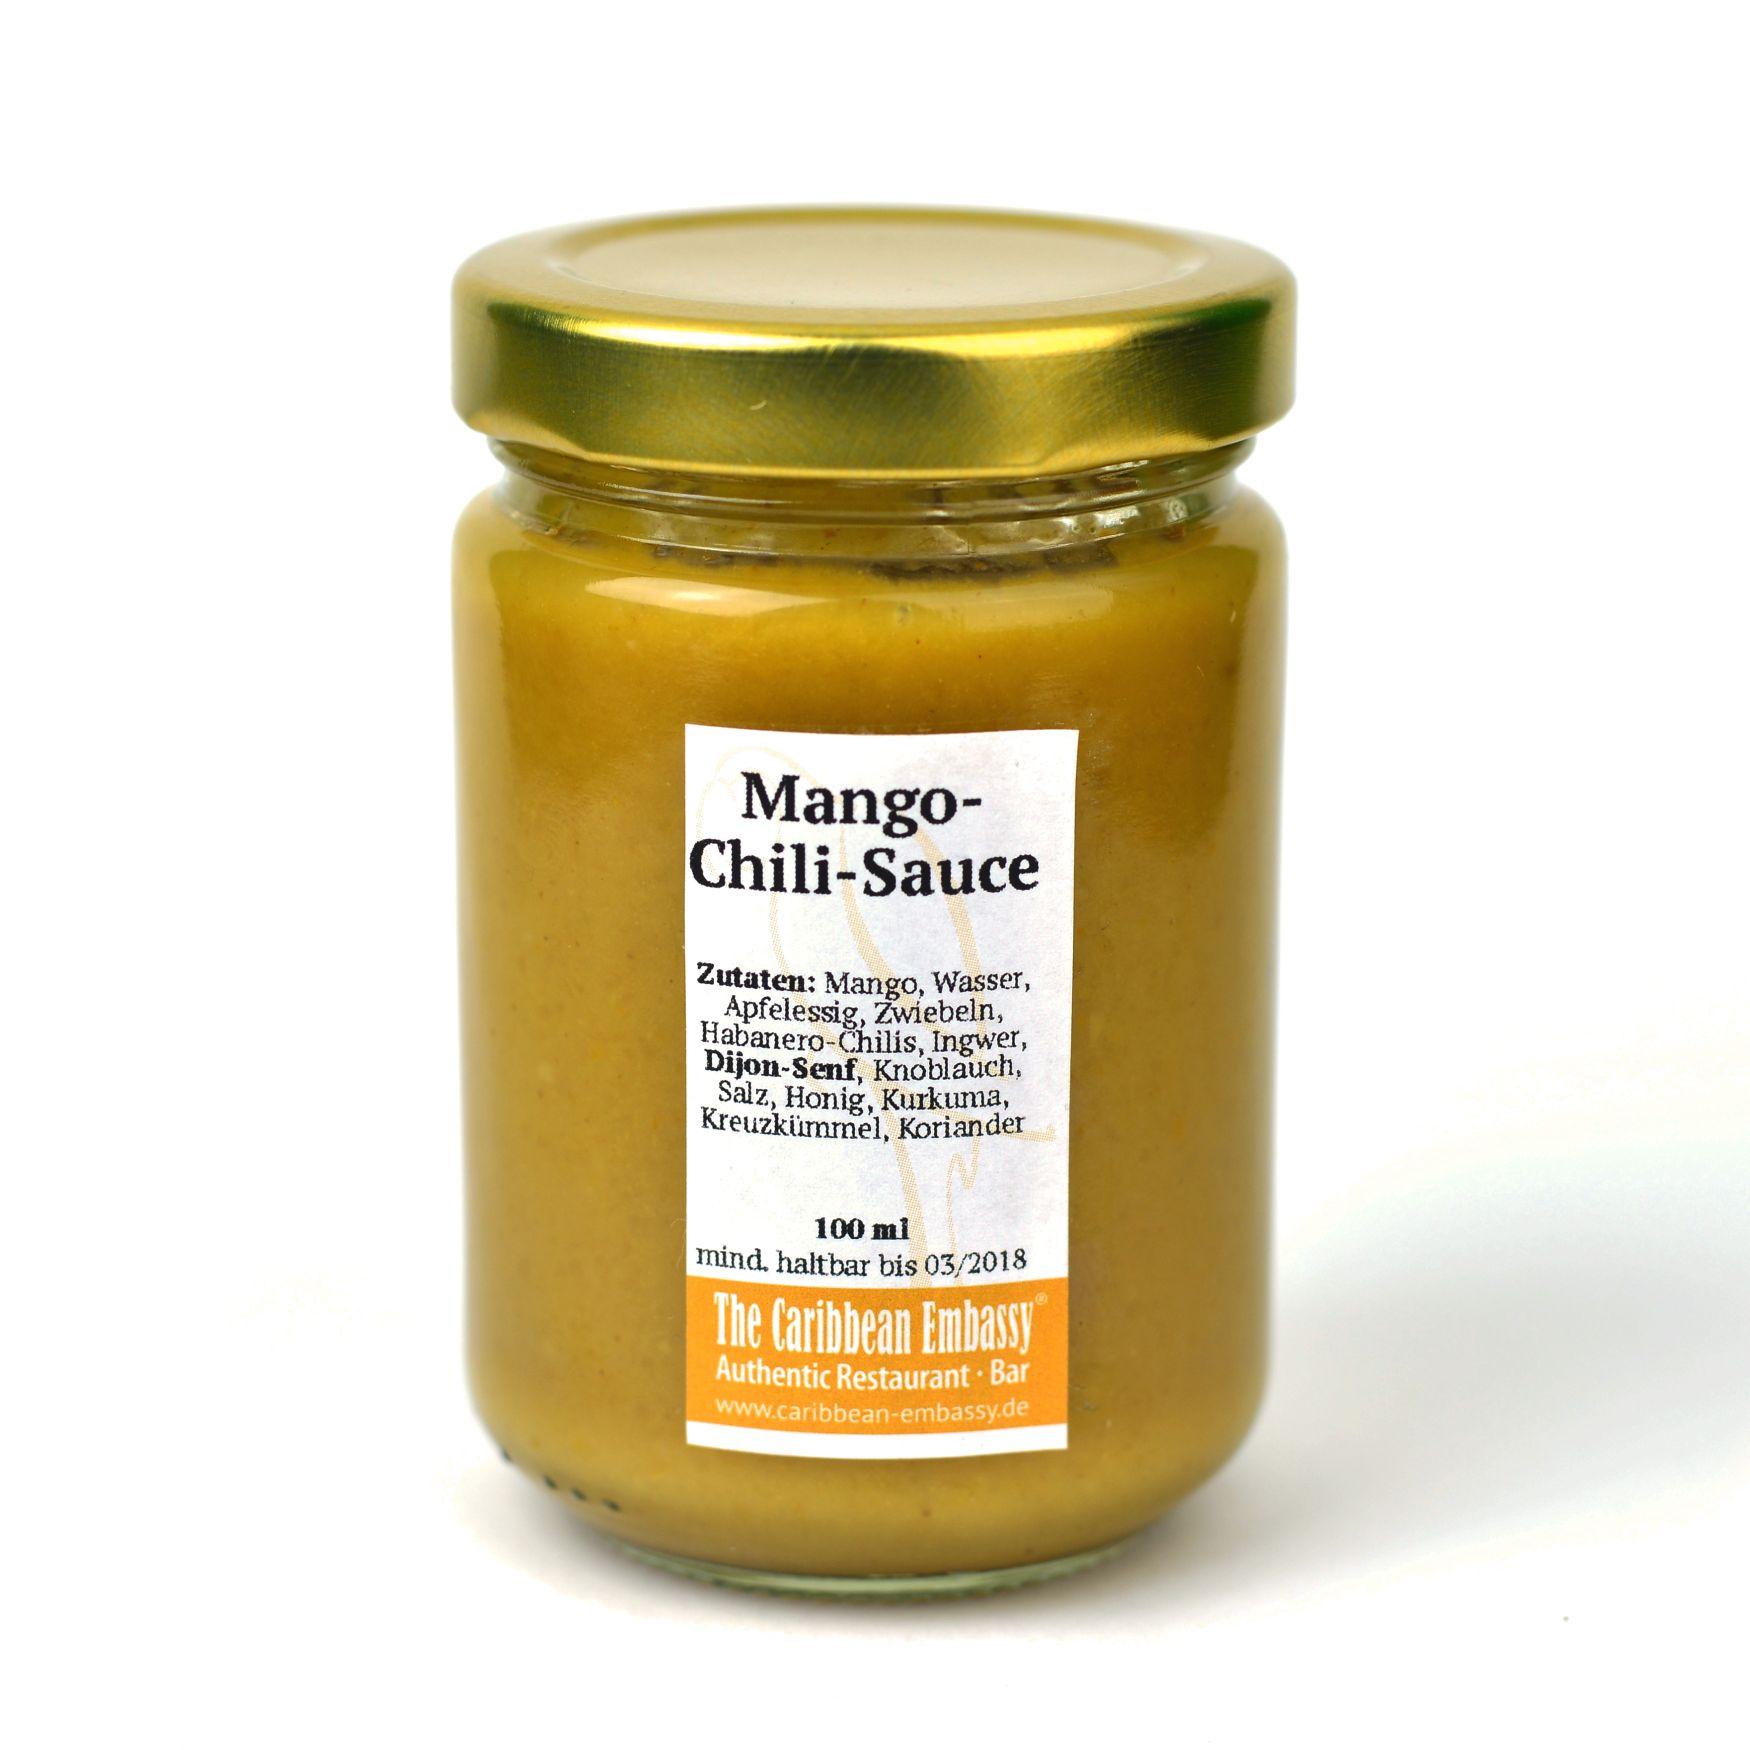 Mango-Chili-Sauce